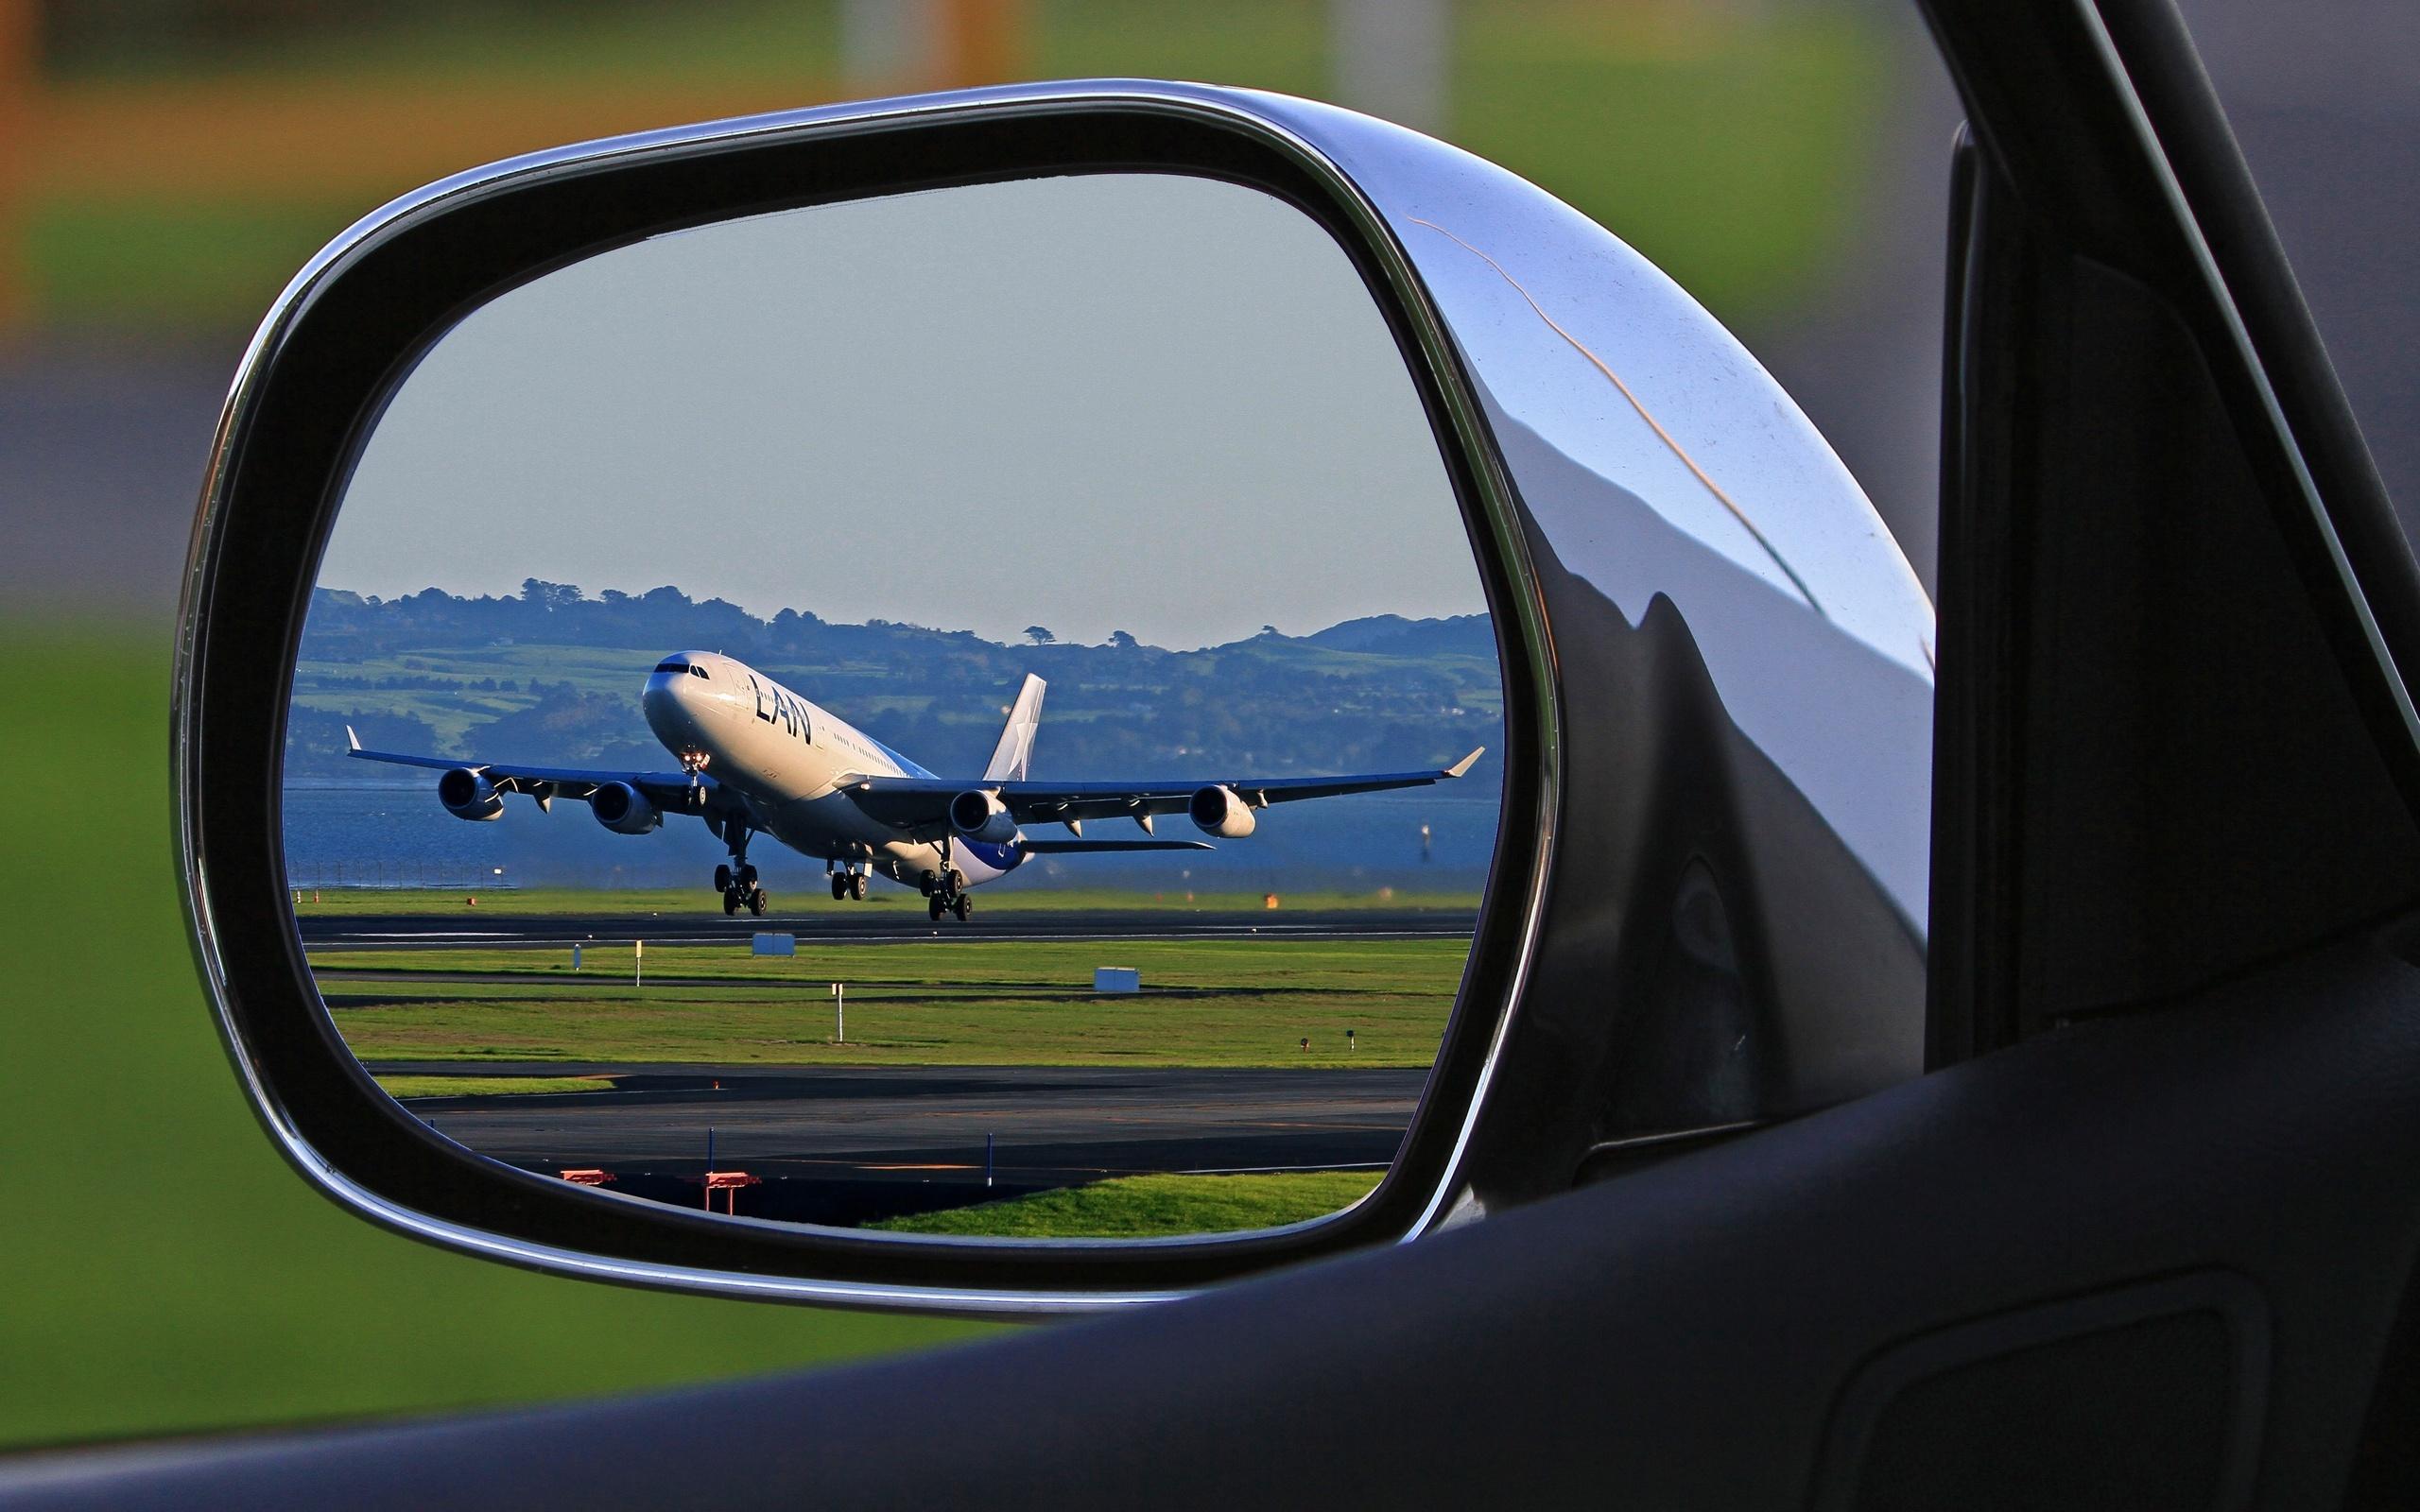 картинки машин на самолетах самолета аткарском